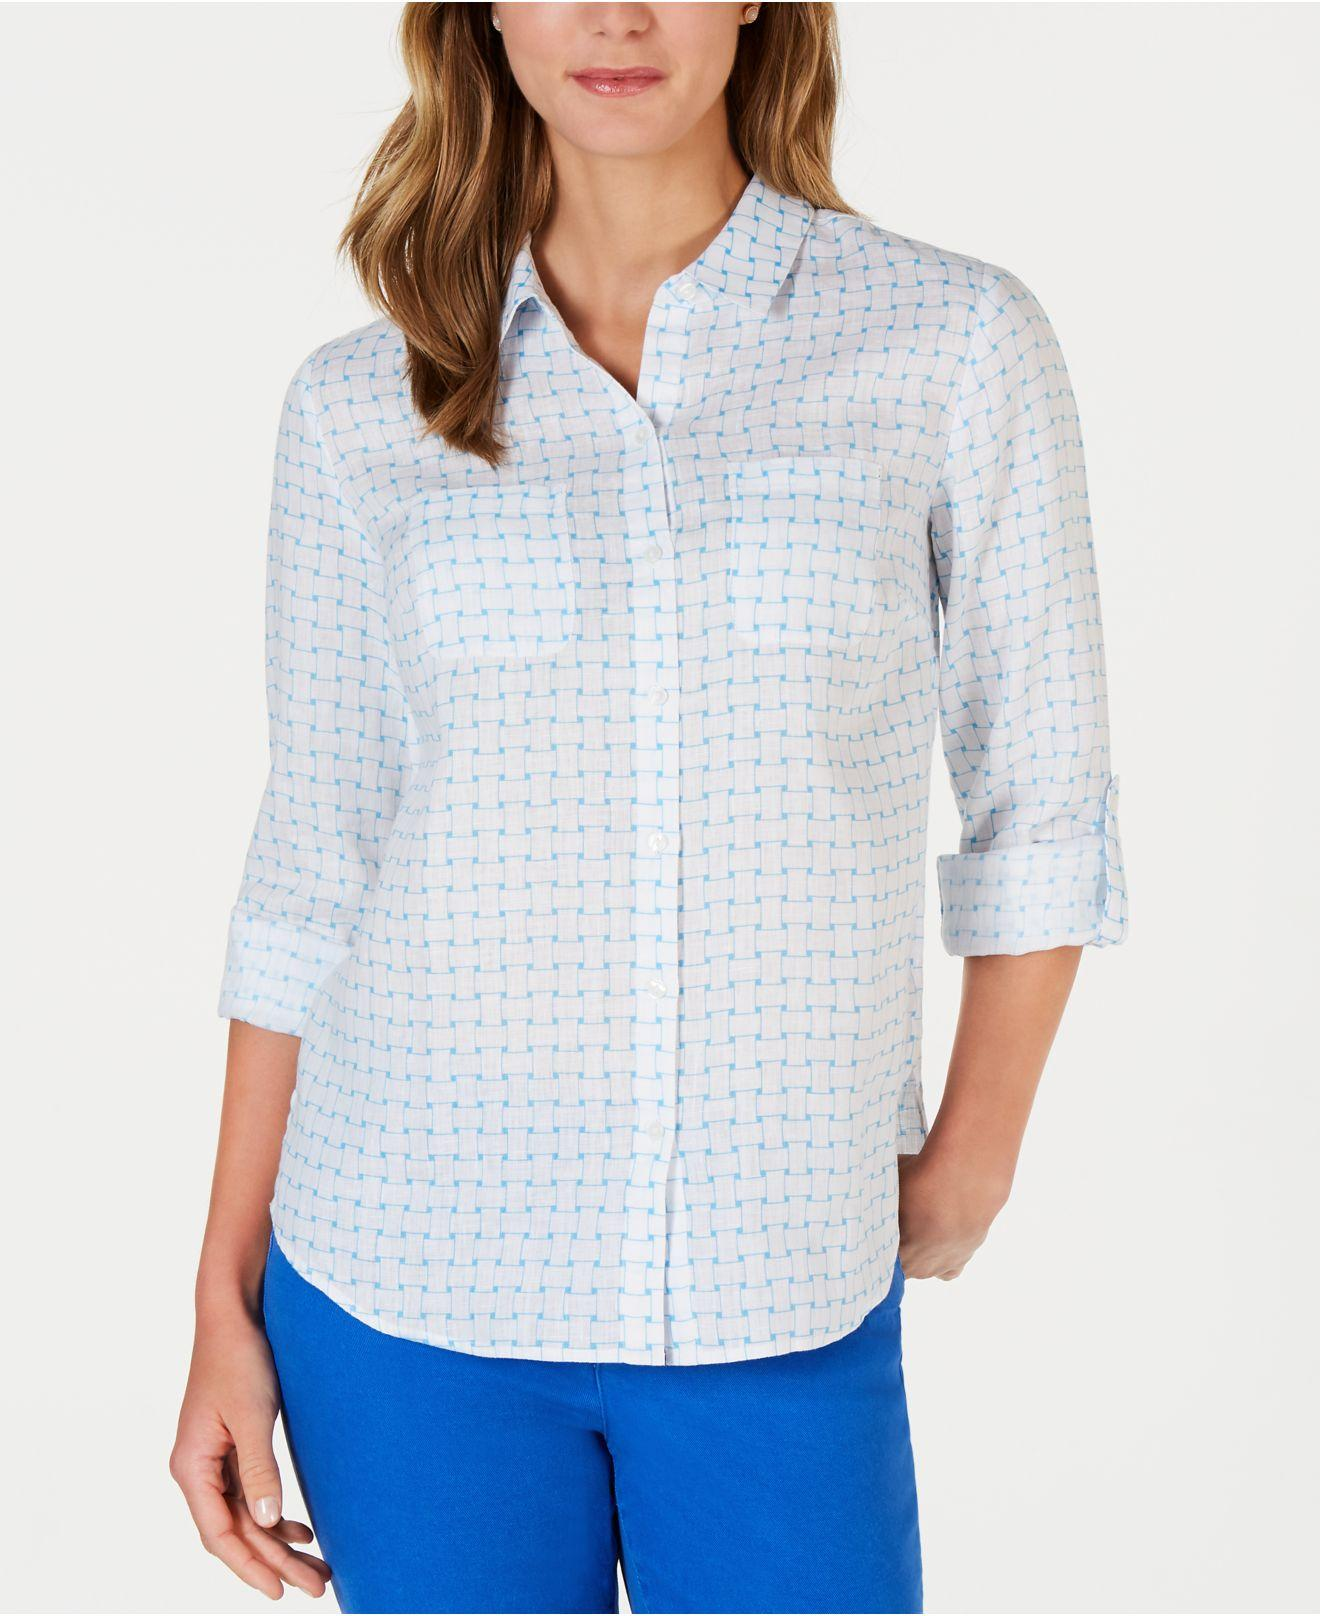 08b220e2455 Charter Club. Women s Blue Printed Linen Shirt ...